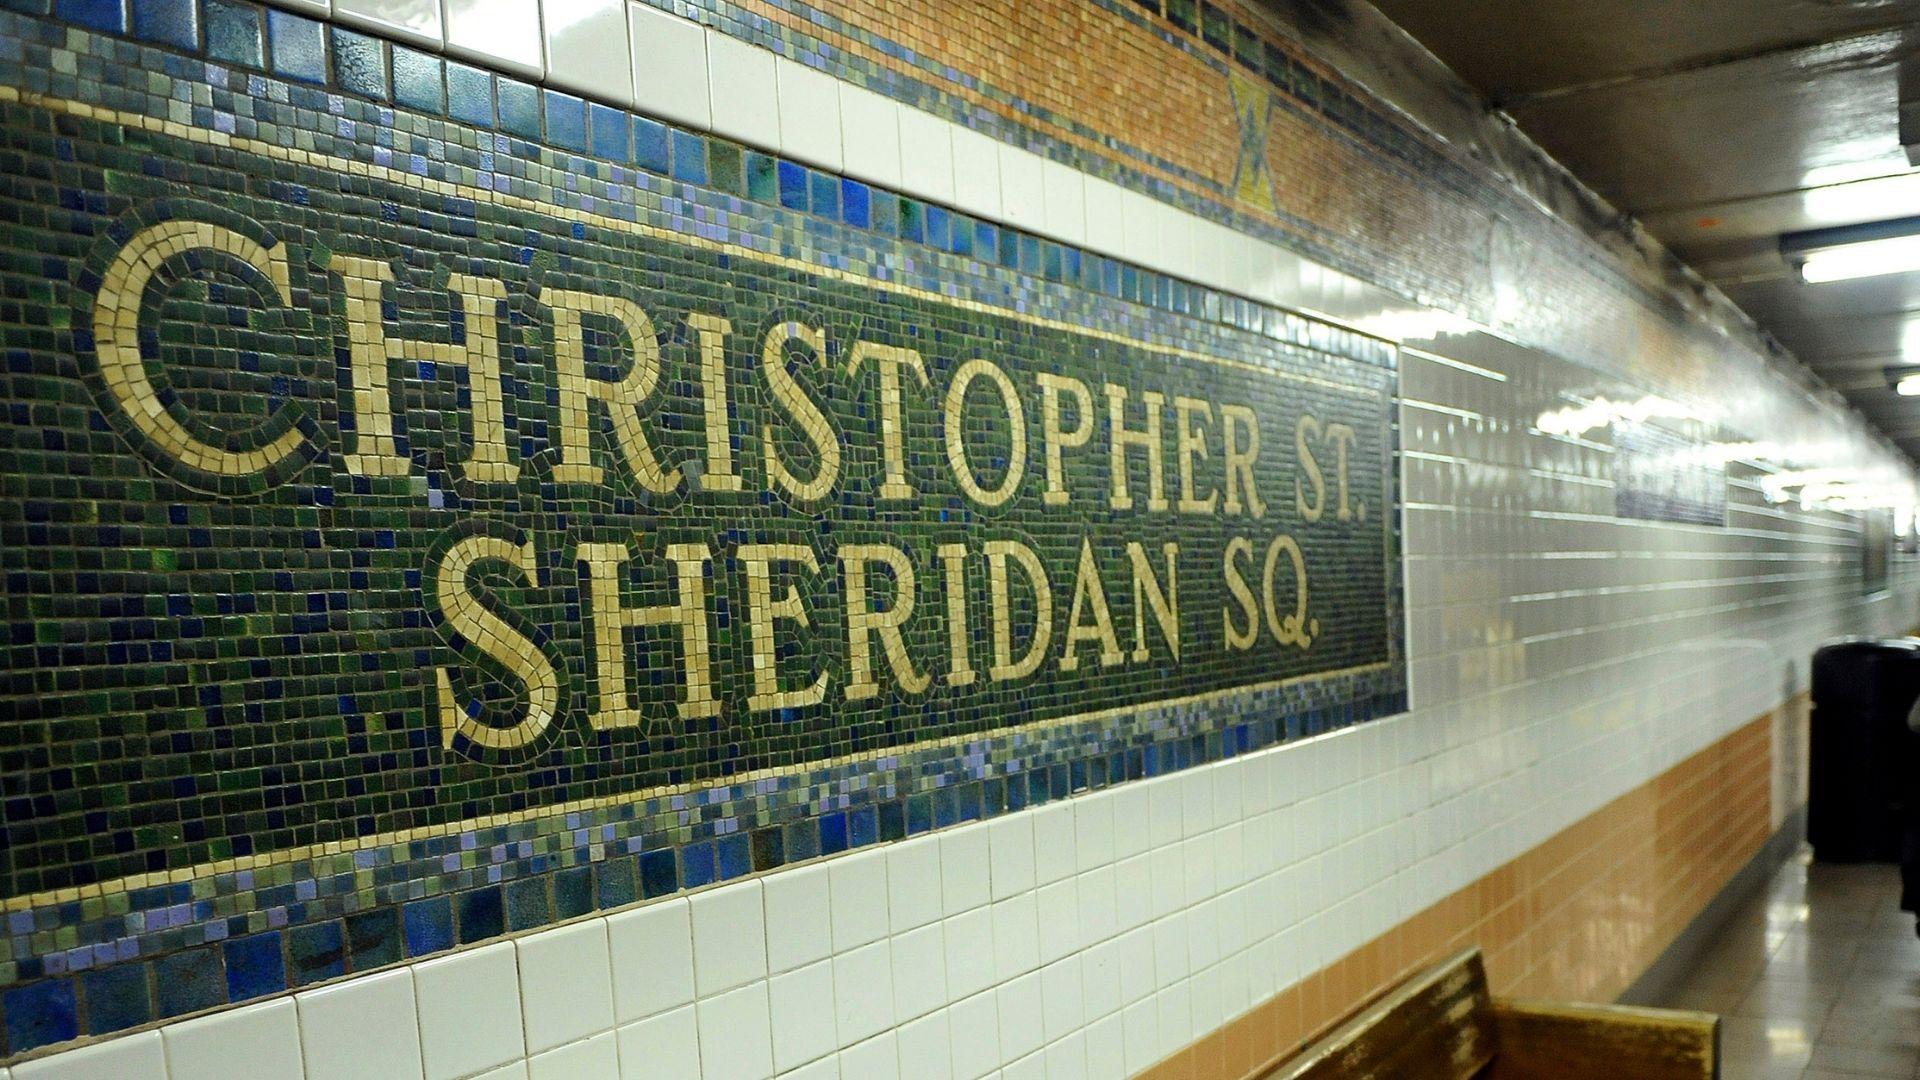 Christopher Street subway station